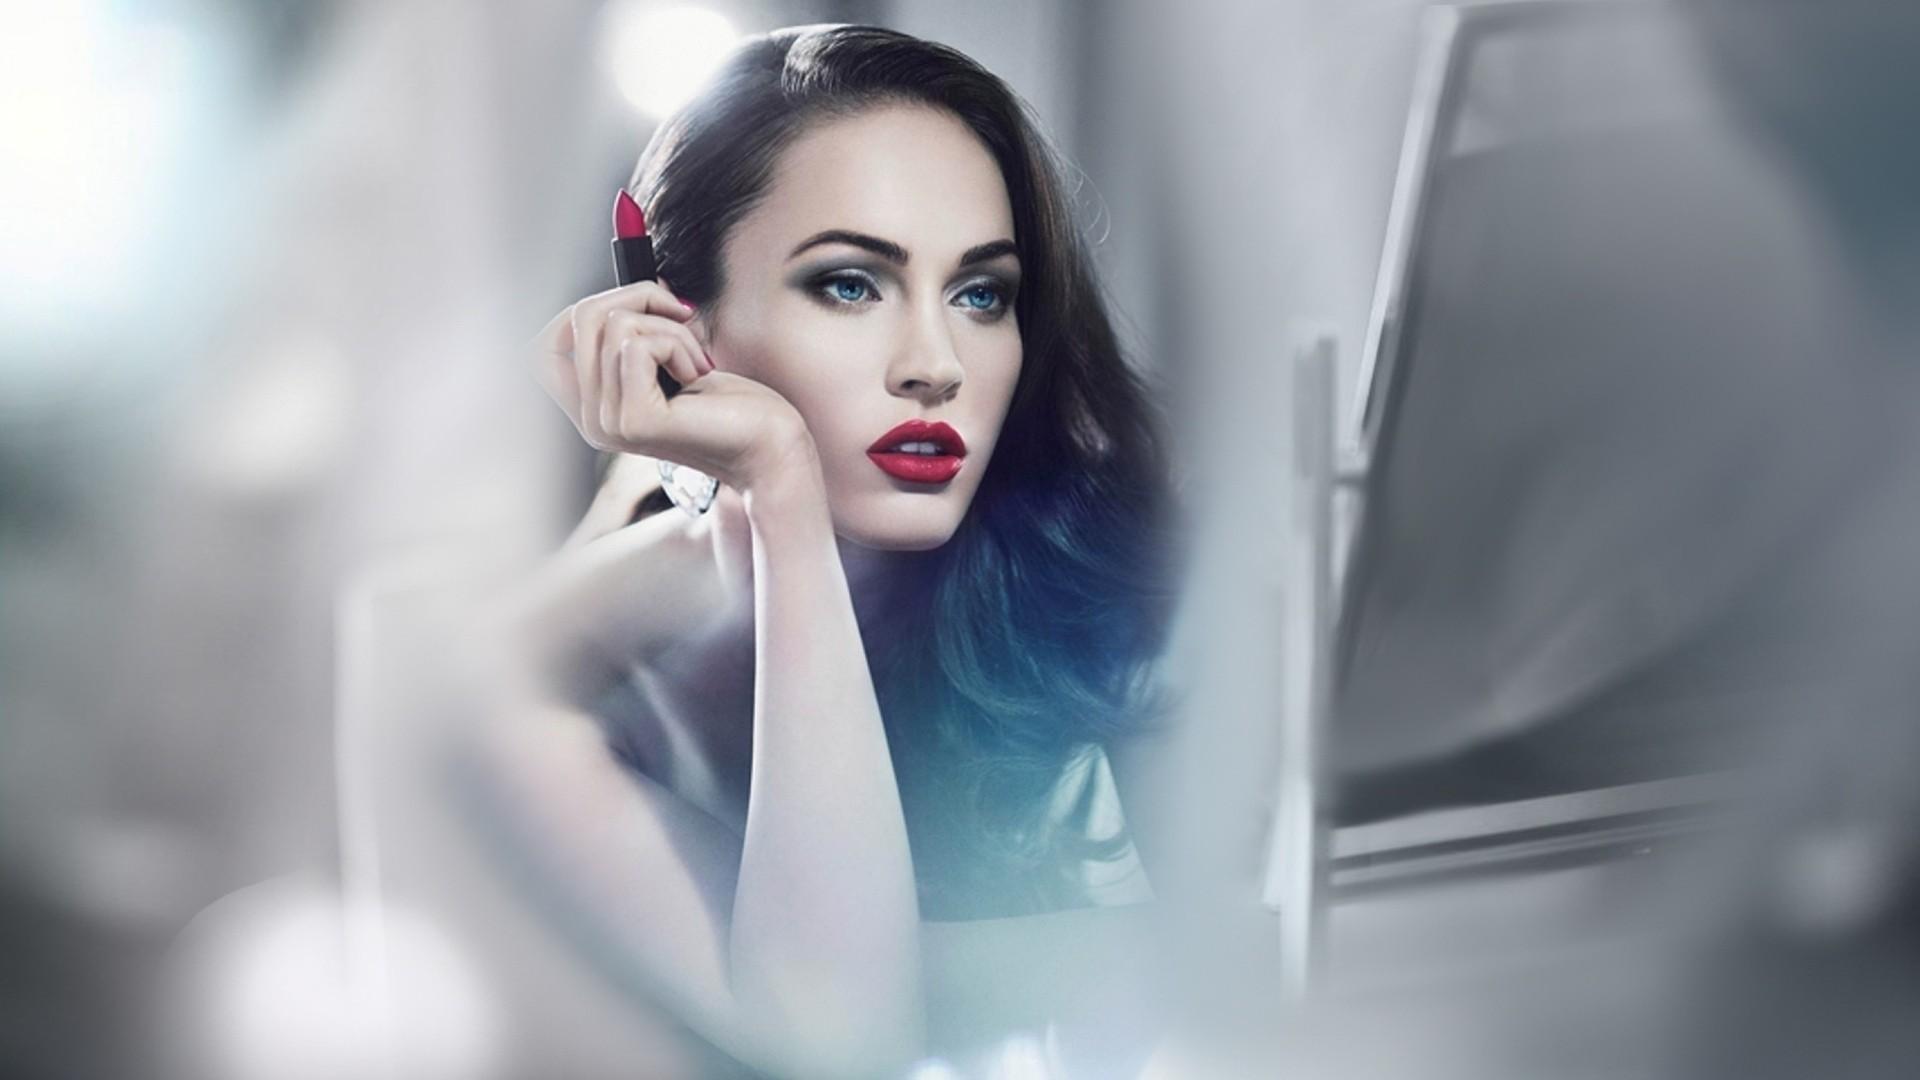 Megan Fox 13 Wallpapers HD Wallpapers 1920x1080